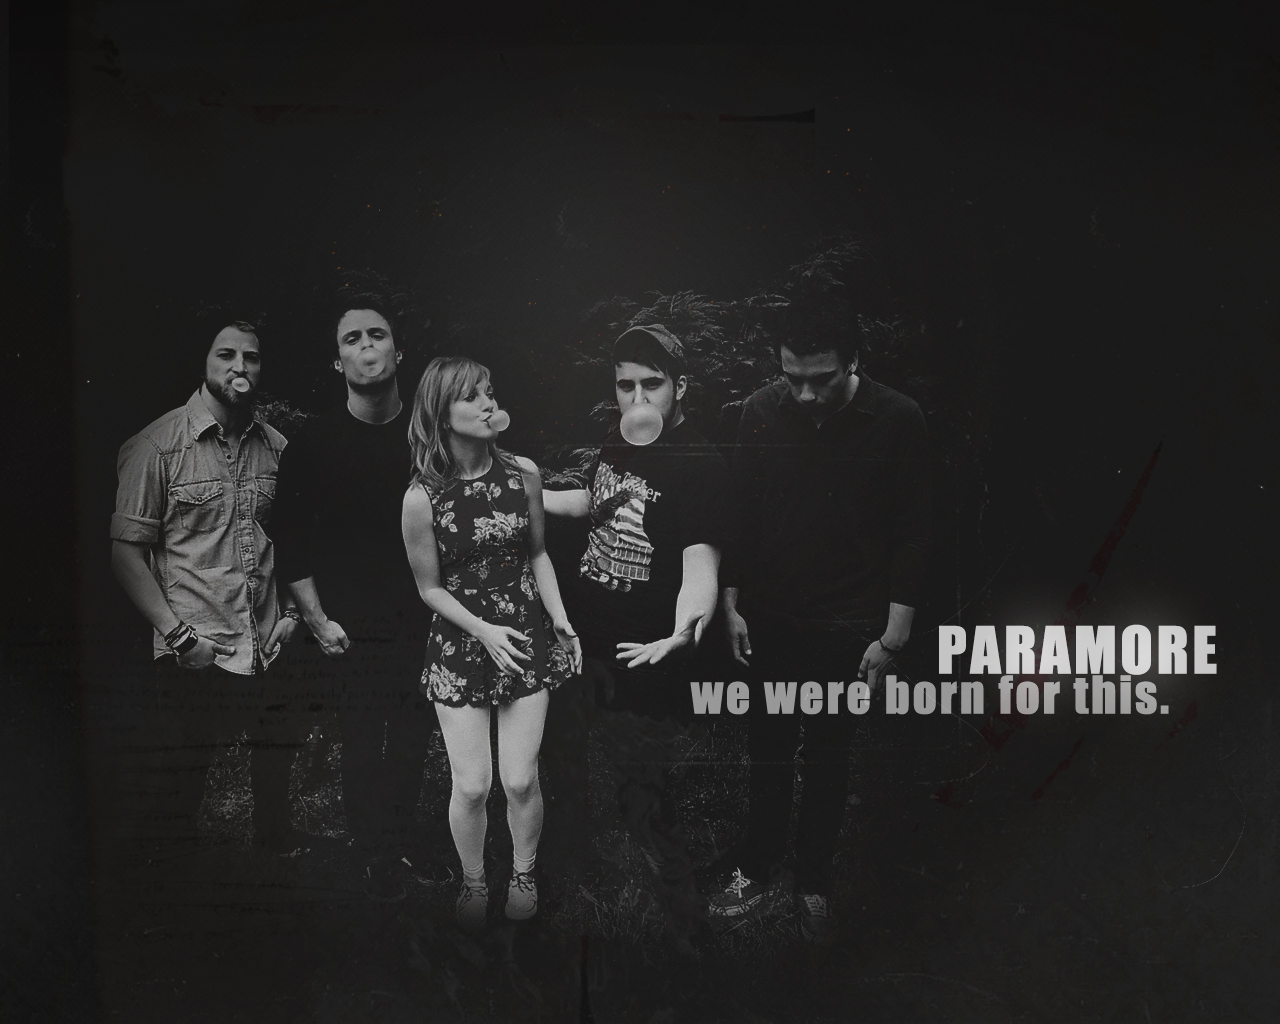 Paramore wallpapers - Paramore Wallpaper (11941443) - Fanpop